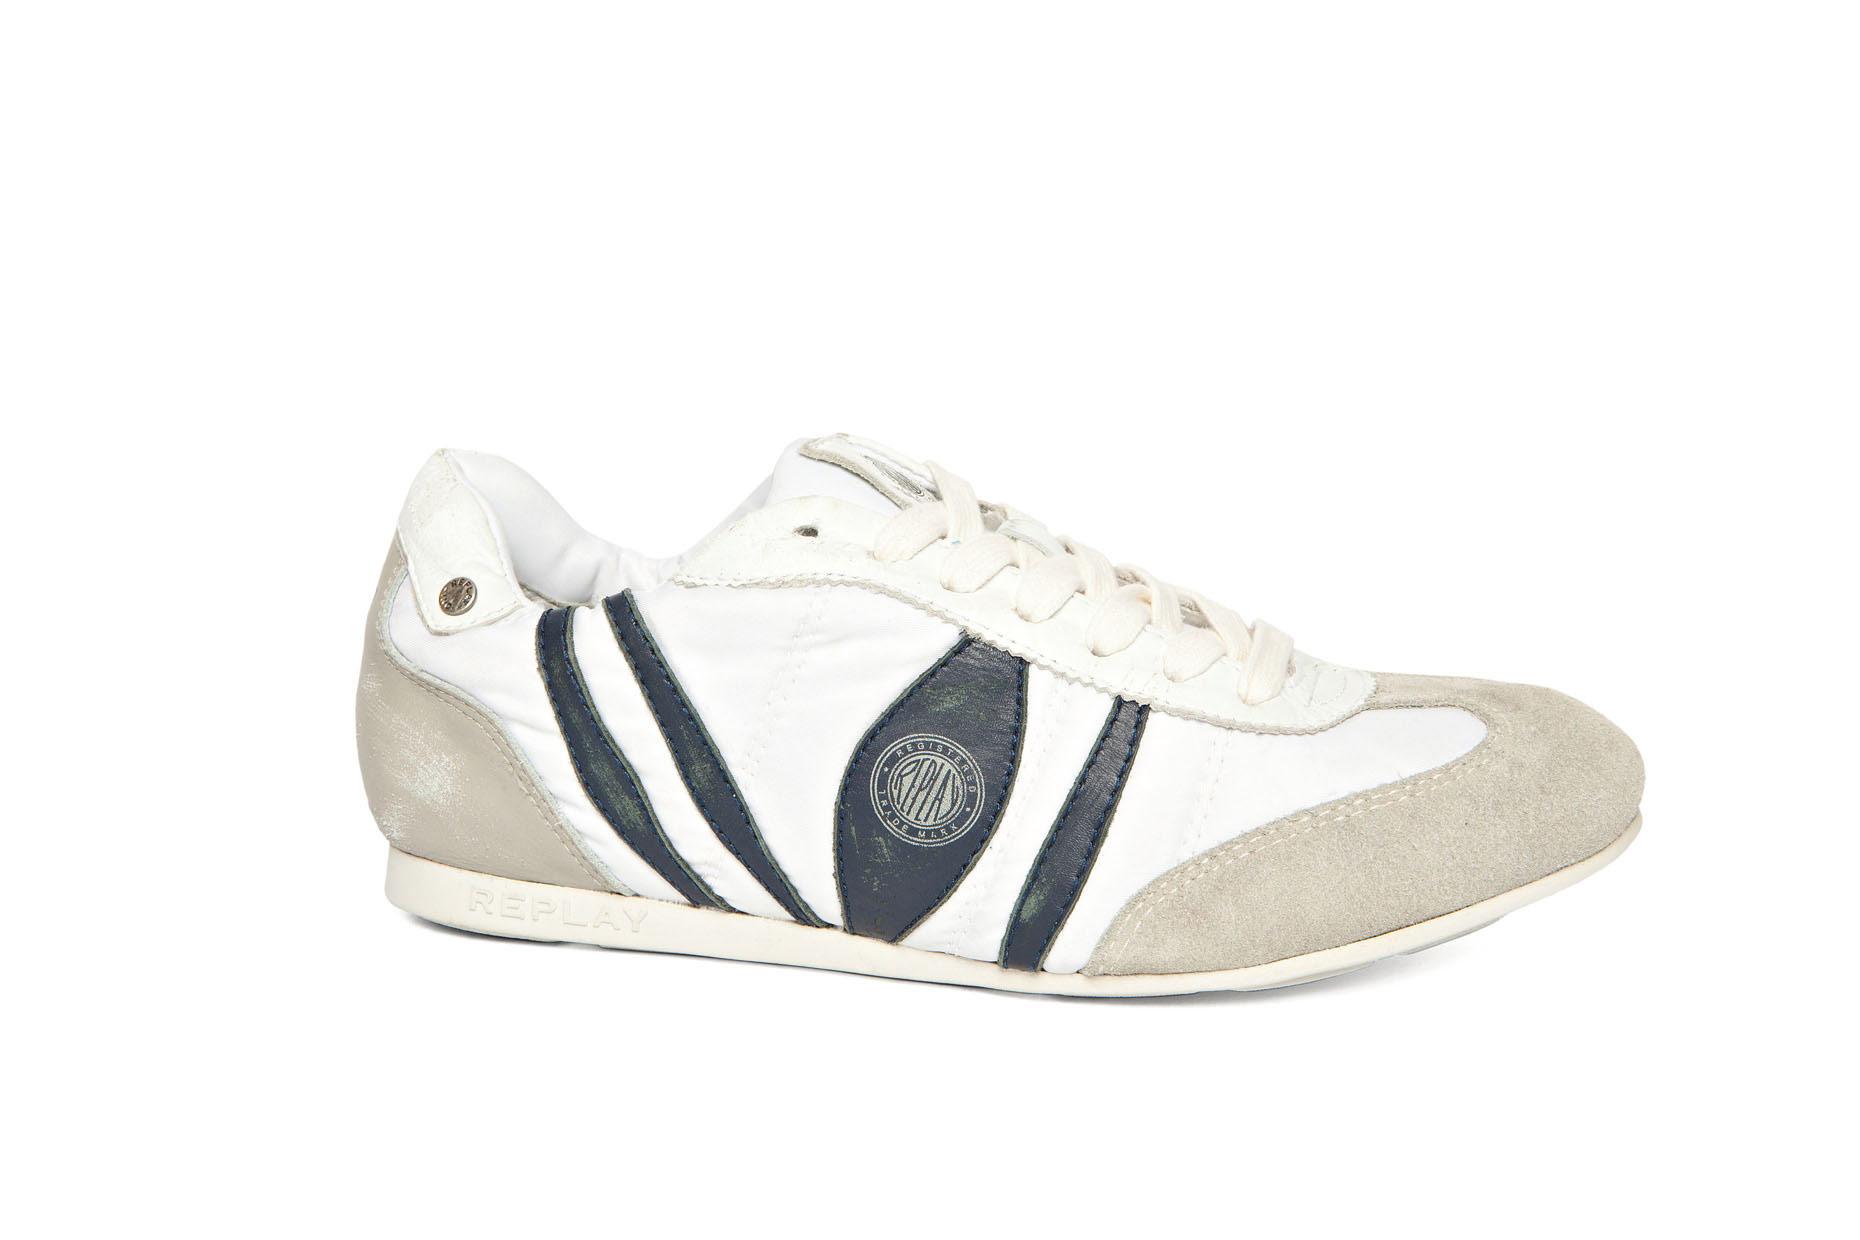 Replay Cipő - Staff - rs170012l-0122 - Office Shoes Magyarország bfe4bf155f